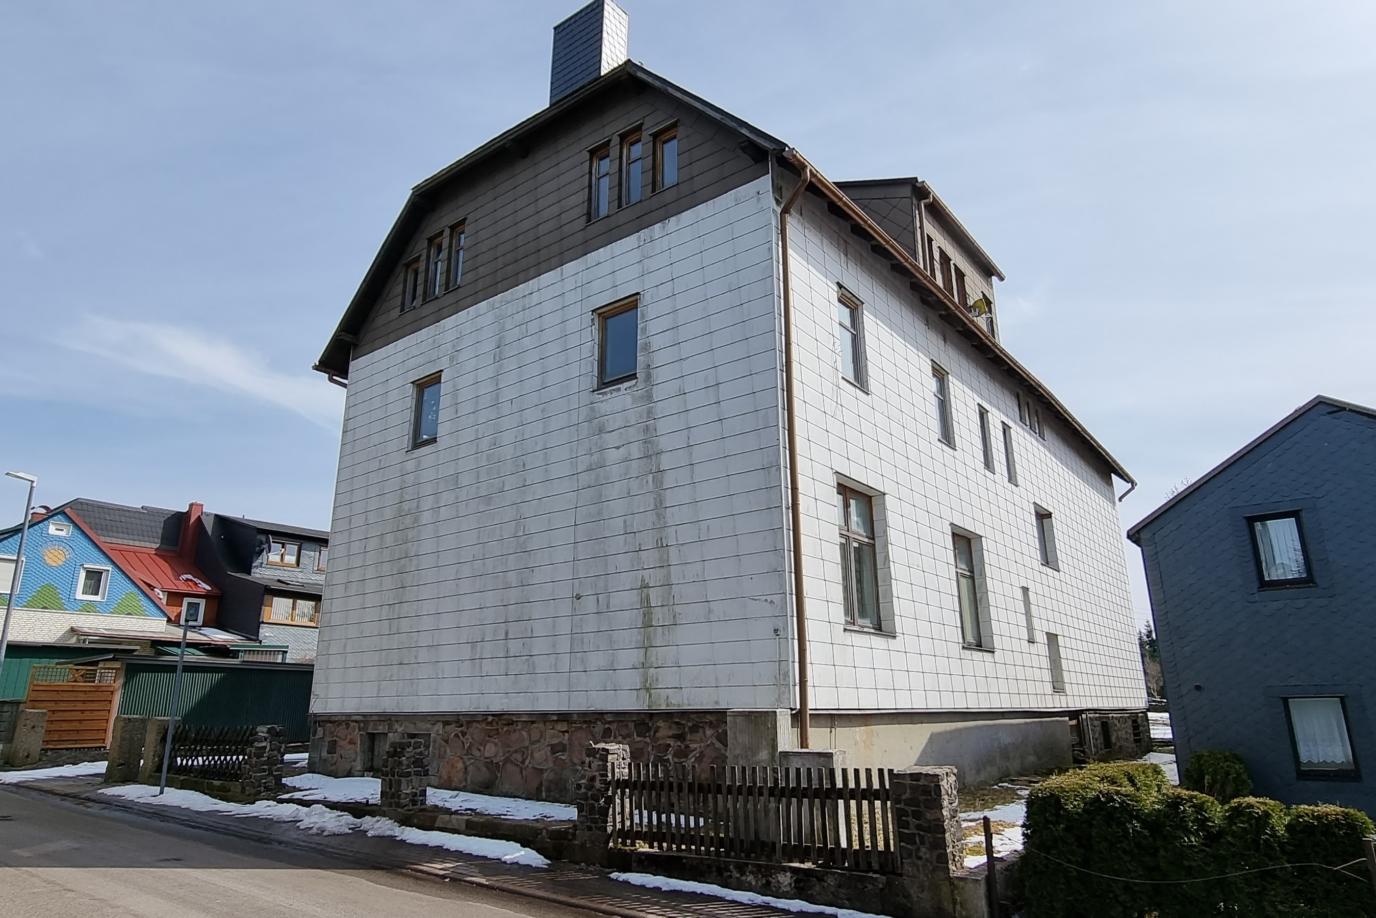 Ehemalige Schule Neustadt